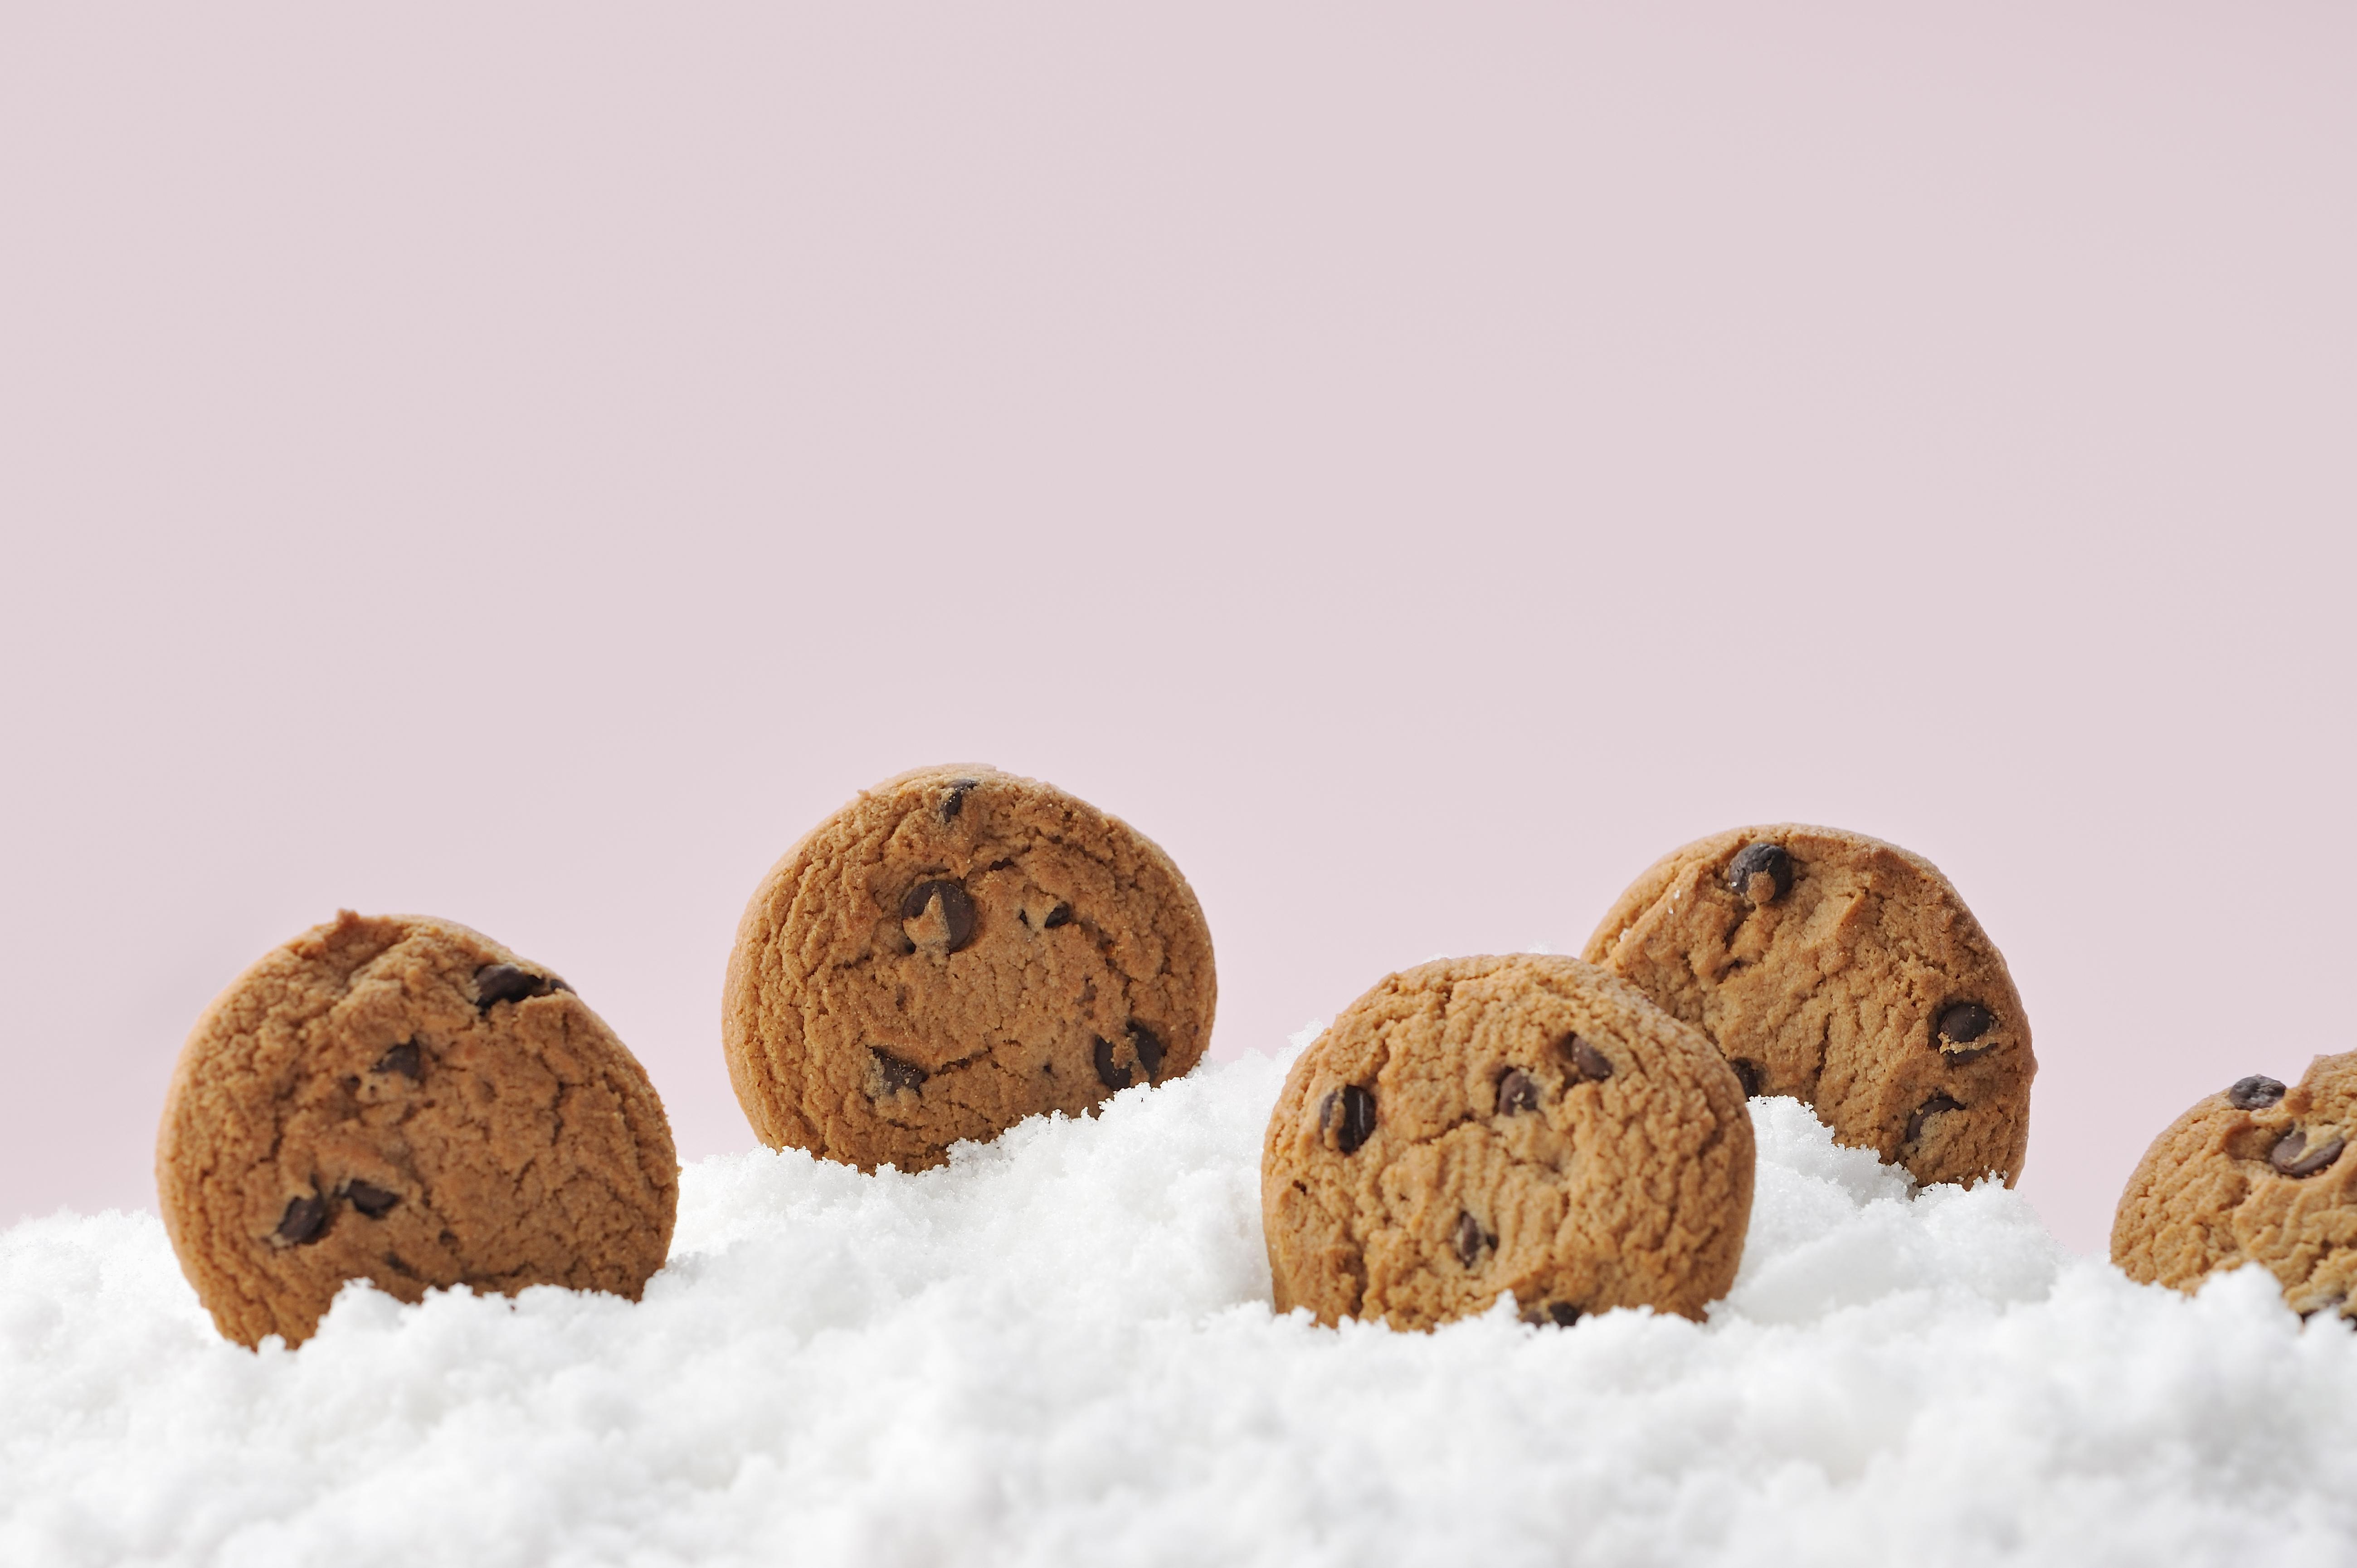 Cookies and sugar